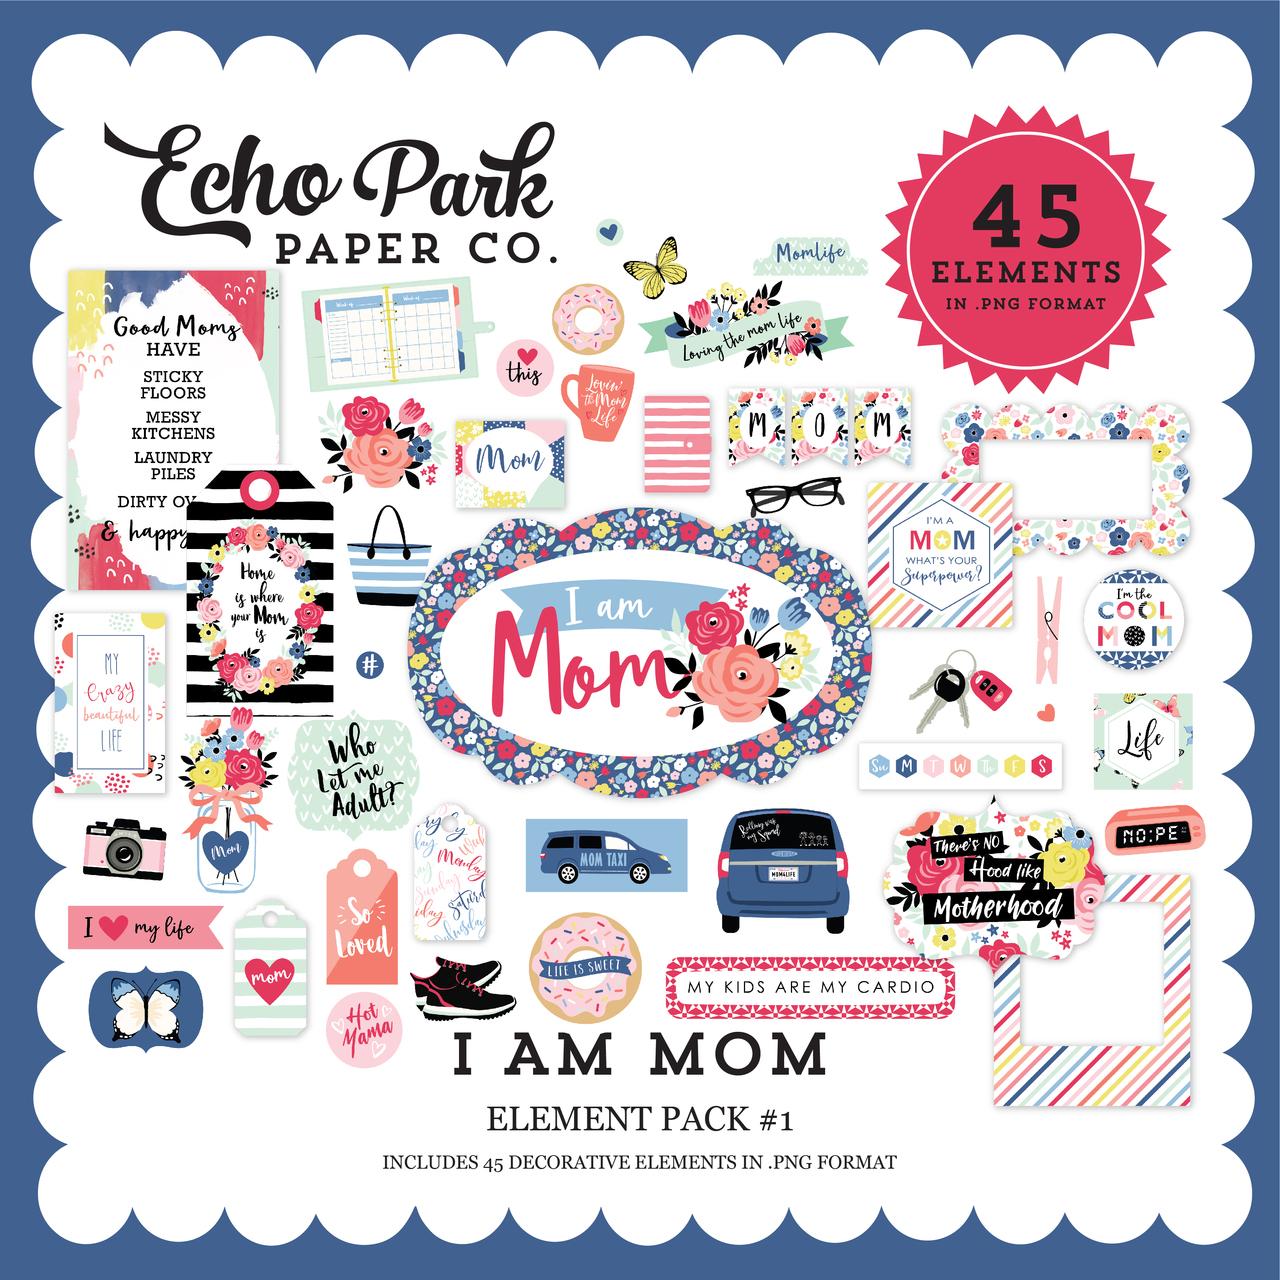 I Am Mom Element Pack #1